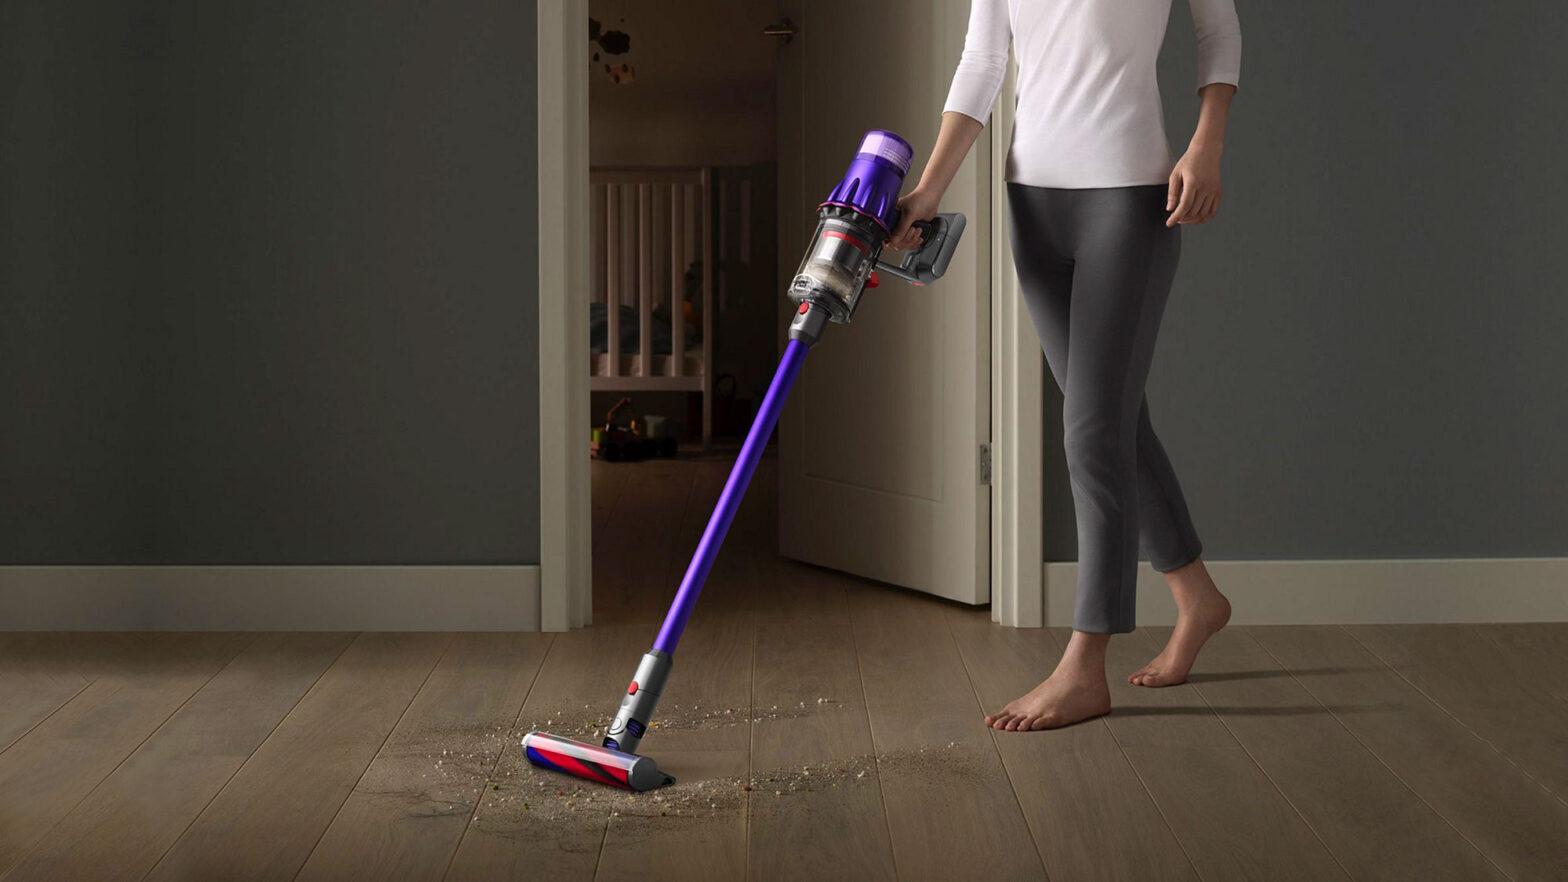 Dyson Digital Slim Cordless Stick Vacuum Cleaner